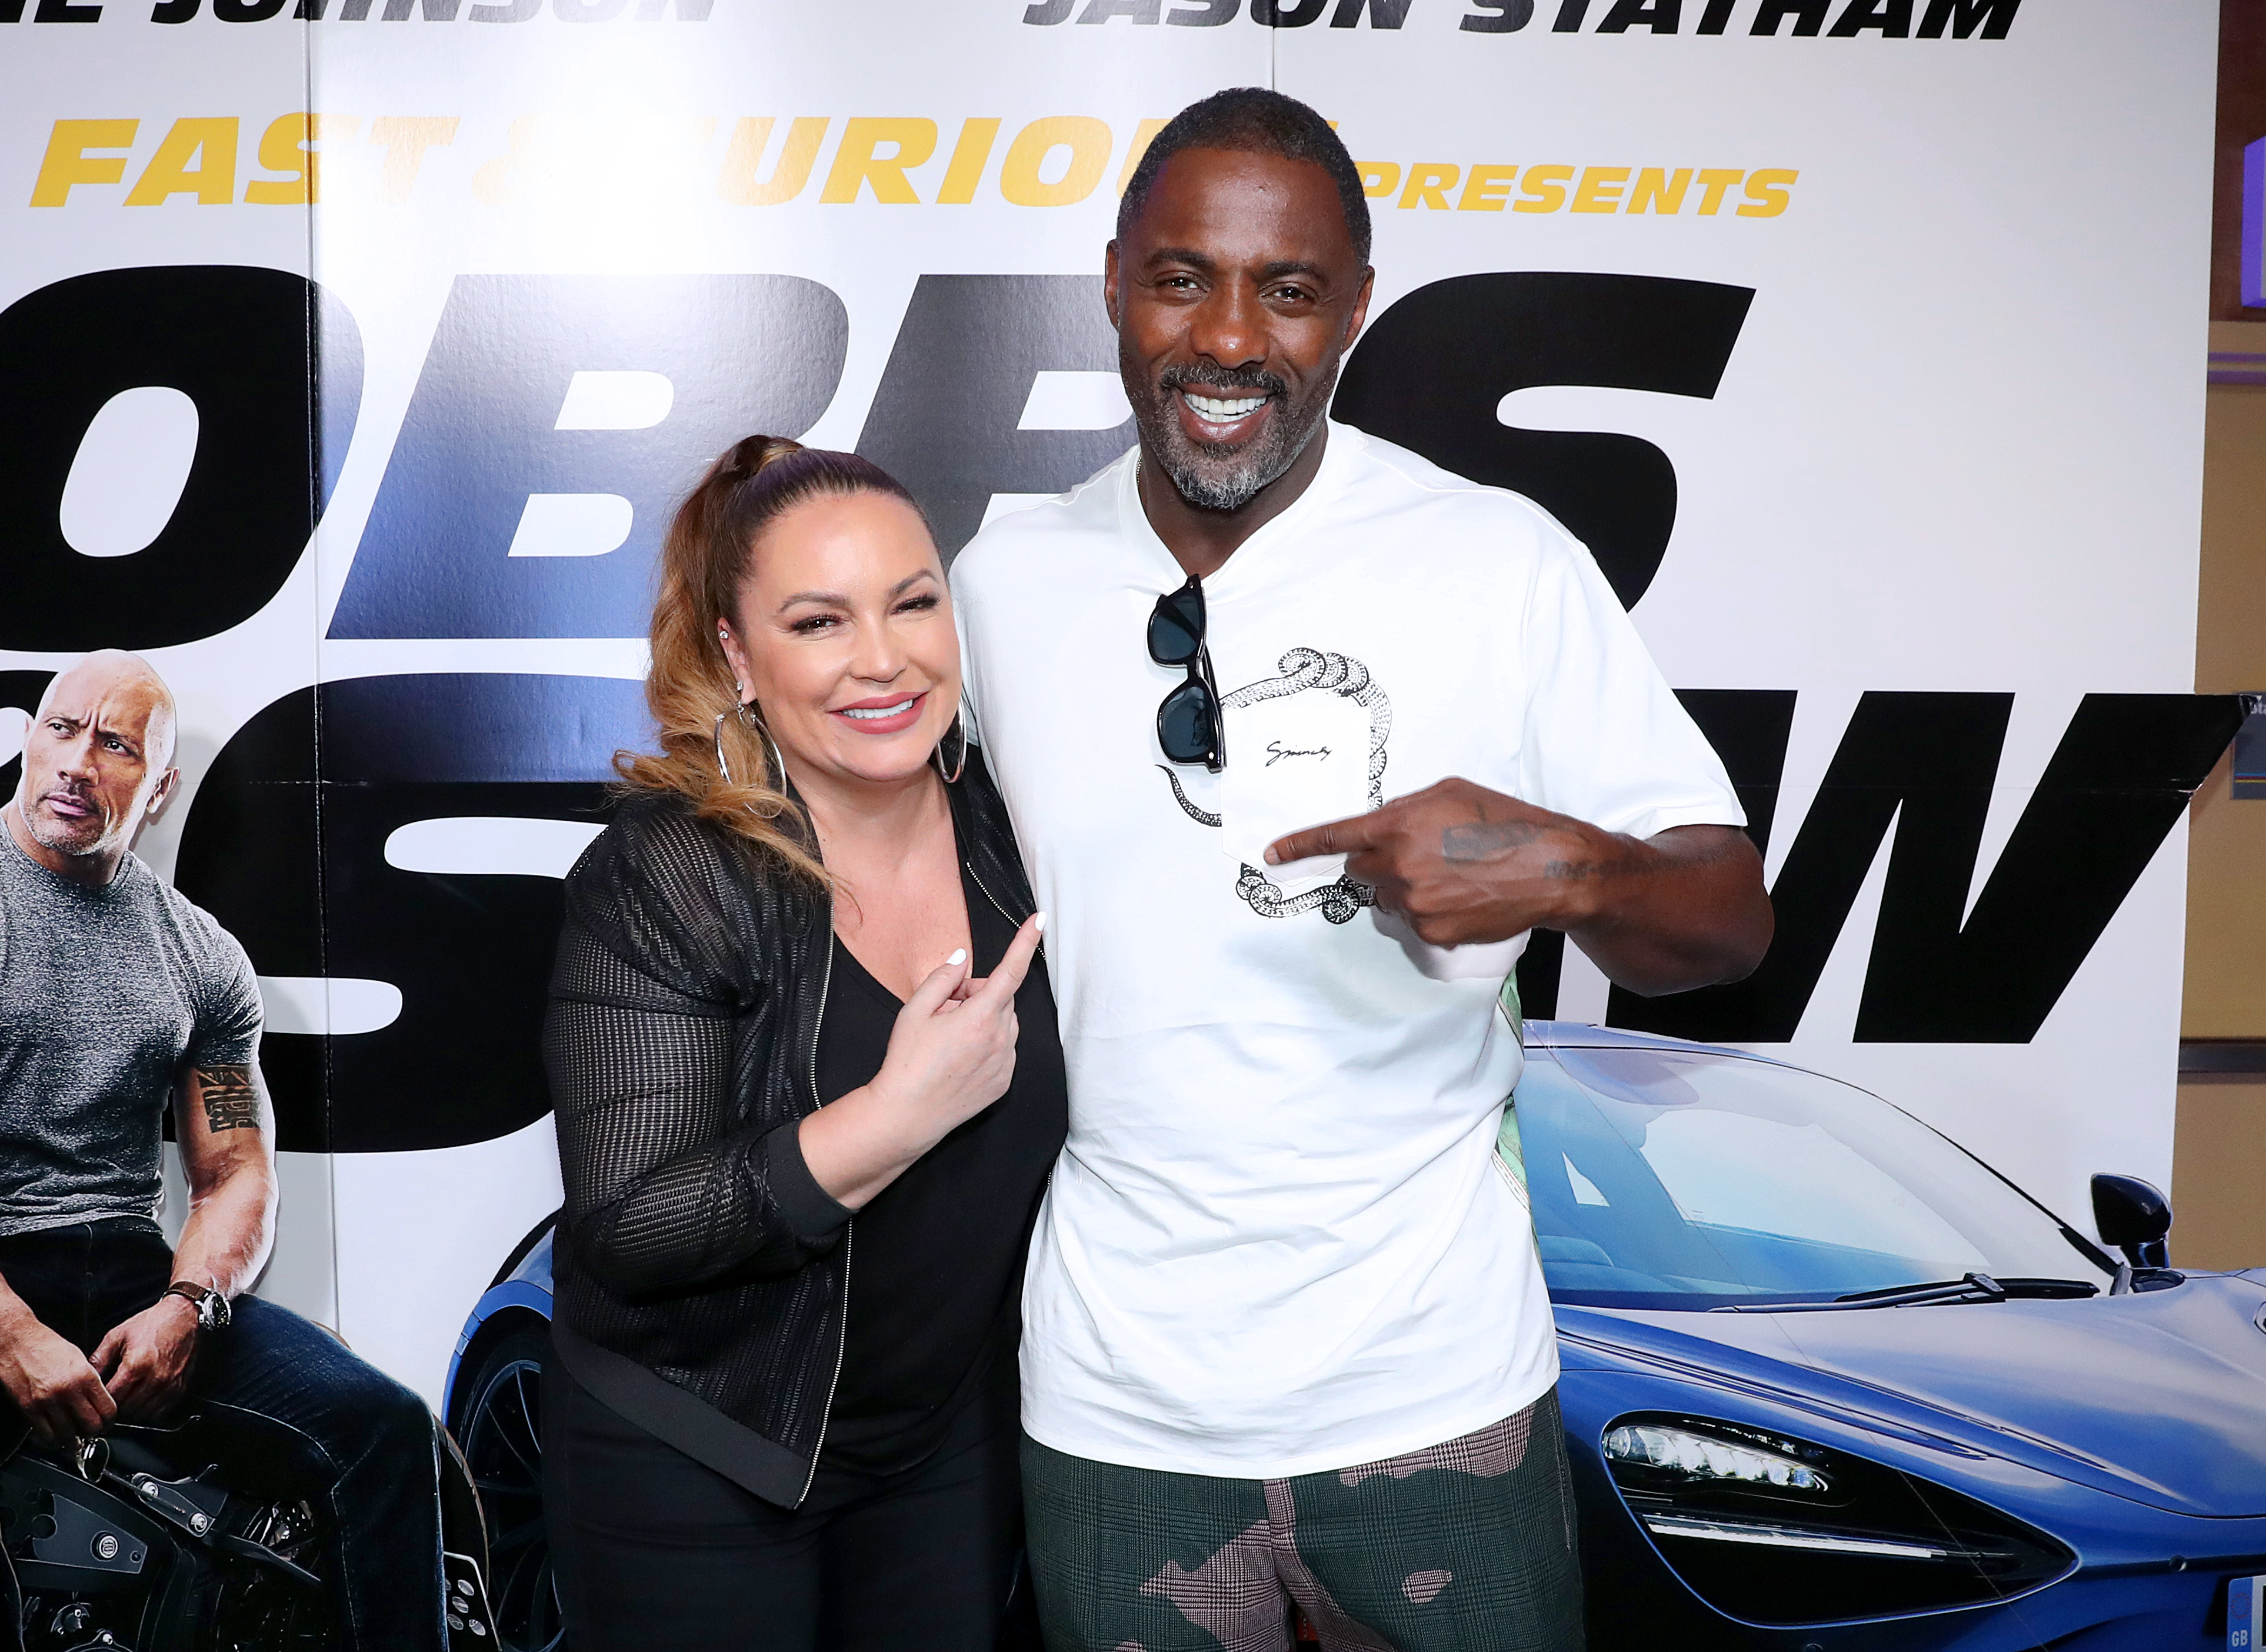 Hobbs & Shaw Screening Hosted By Angie Martinez & Idris Elba